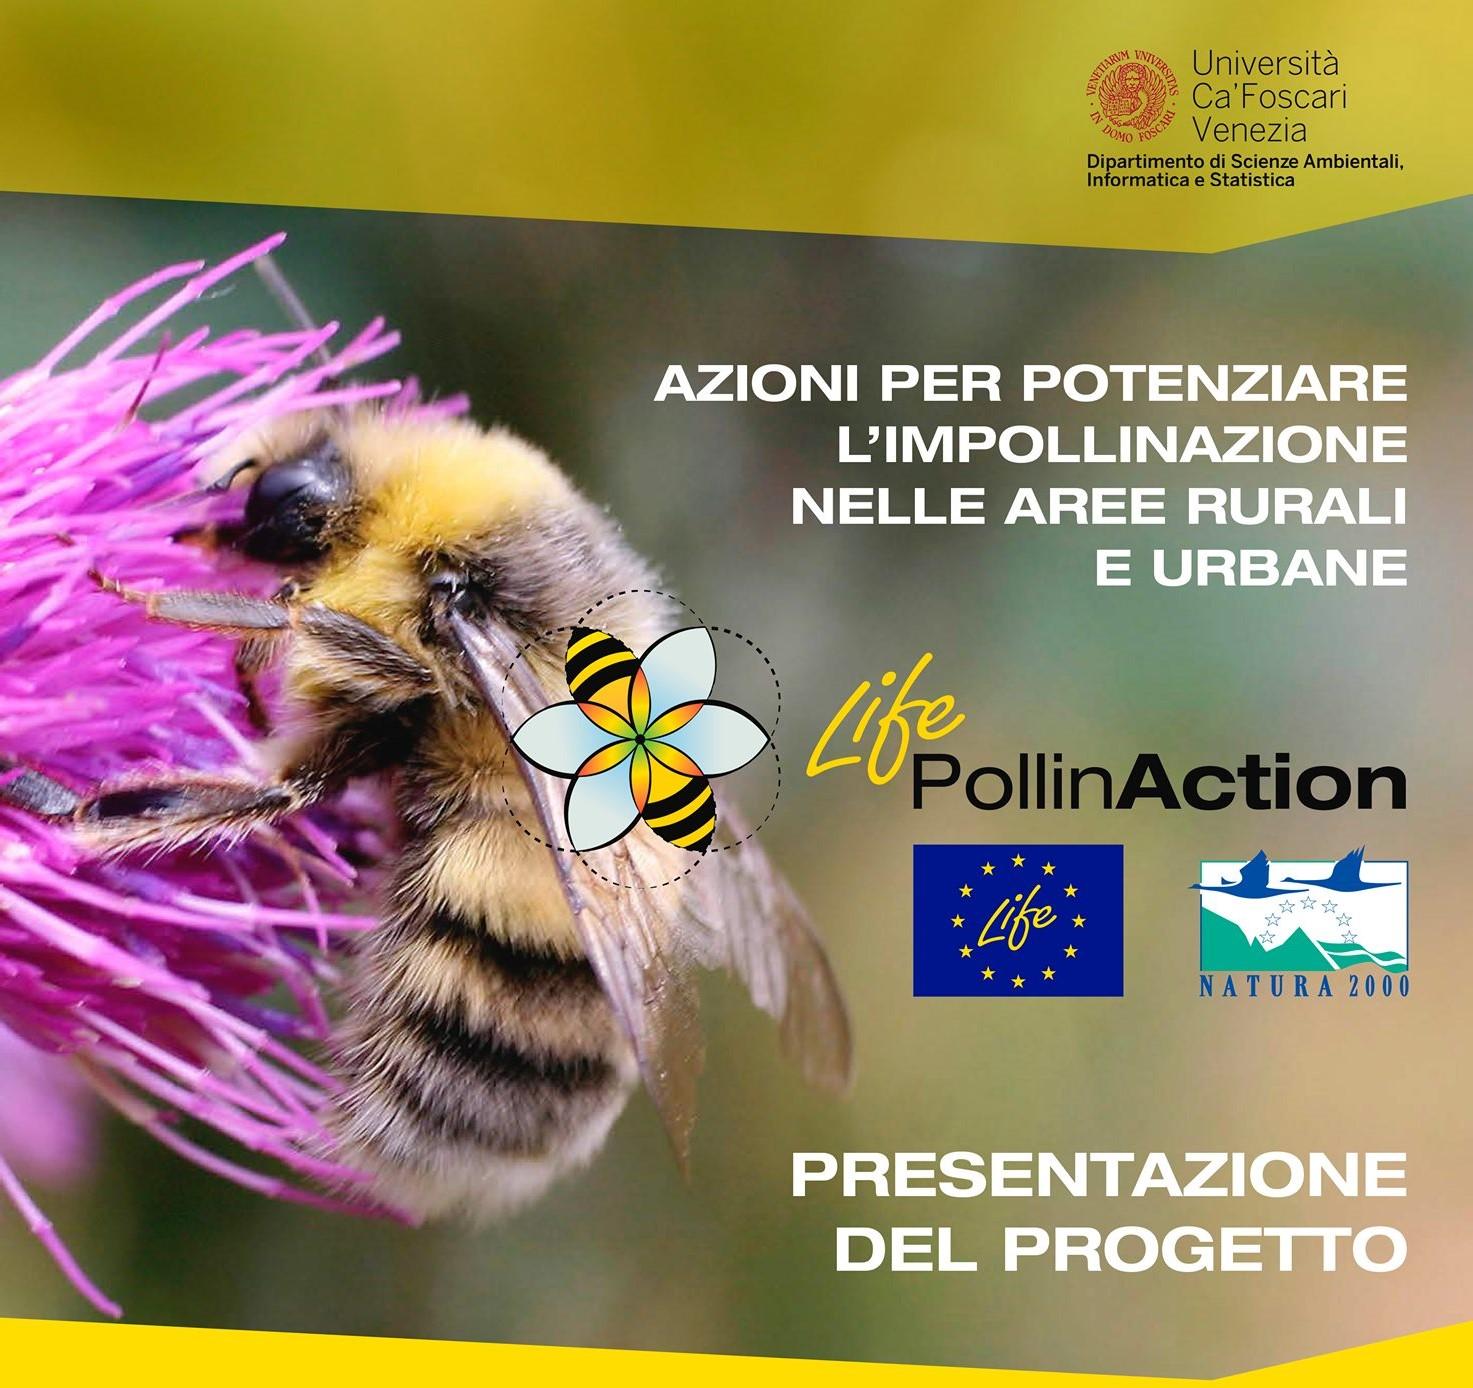 pollinaction.jpg